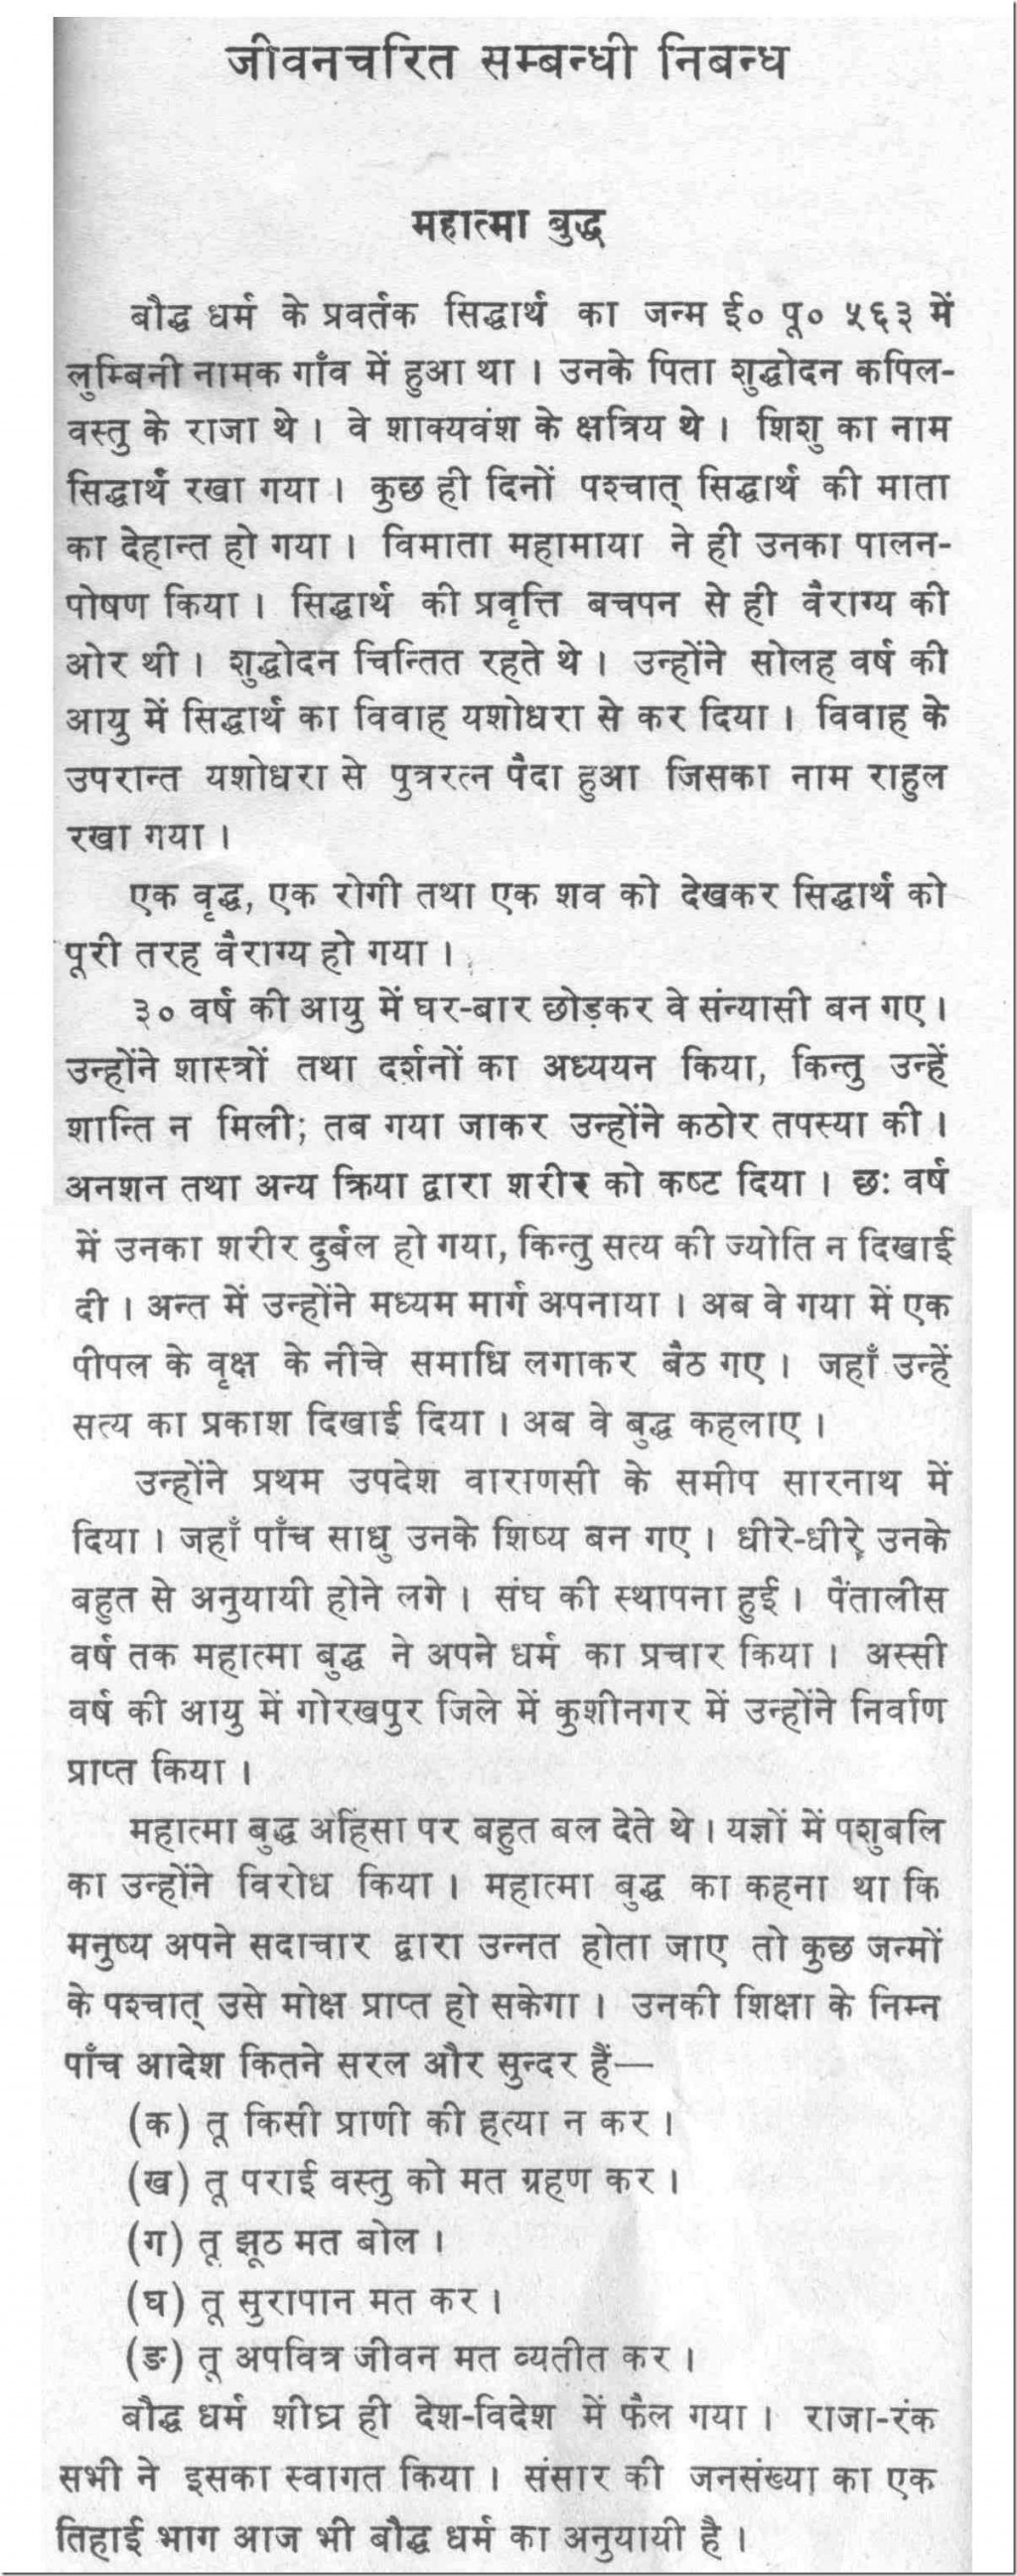 009 Essay Example Mahatma Gandhi In Urdu Hindi L Imposing Language Jayanti Speech Large